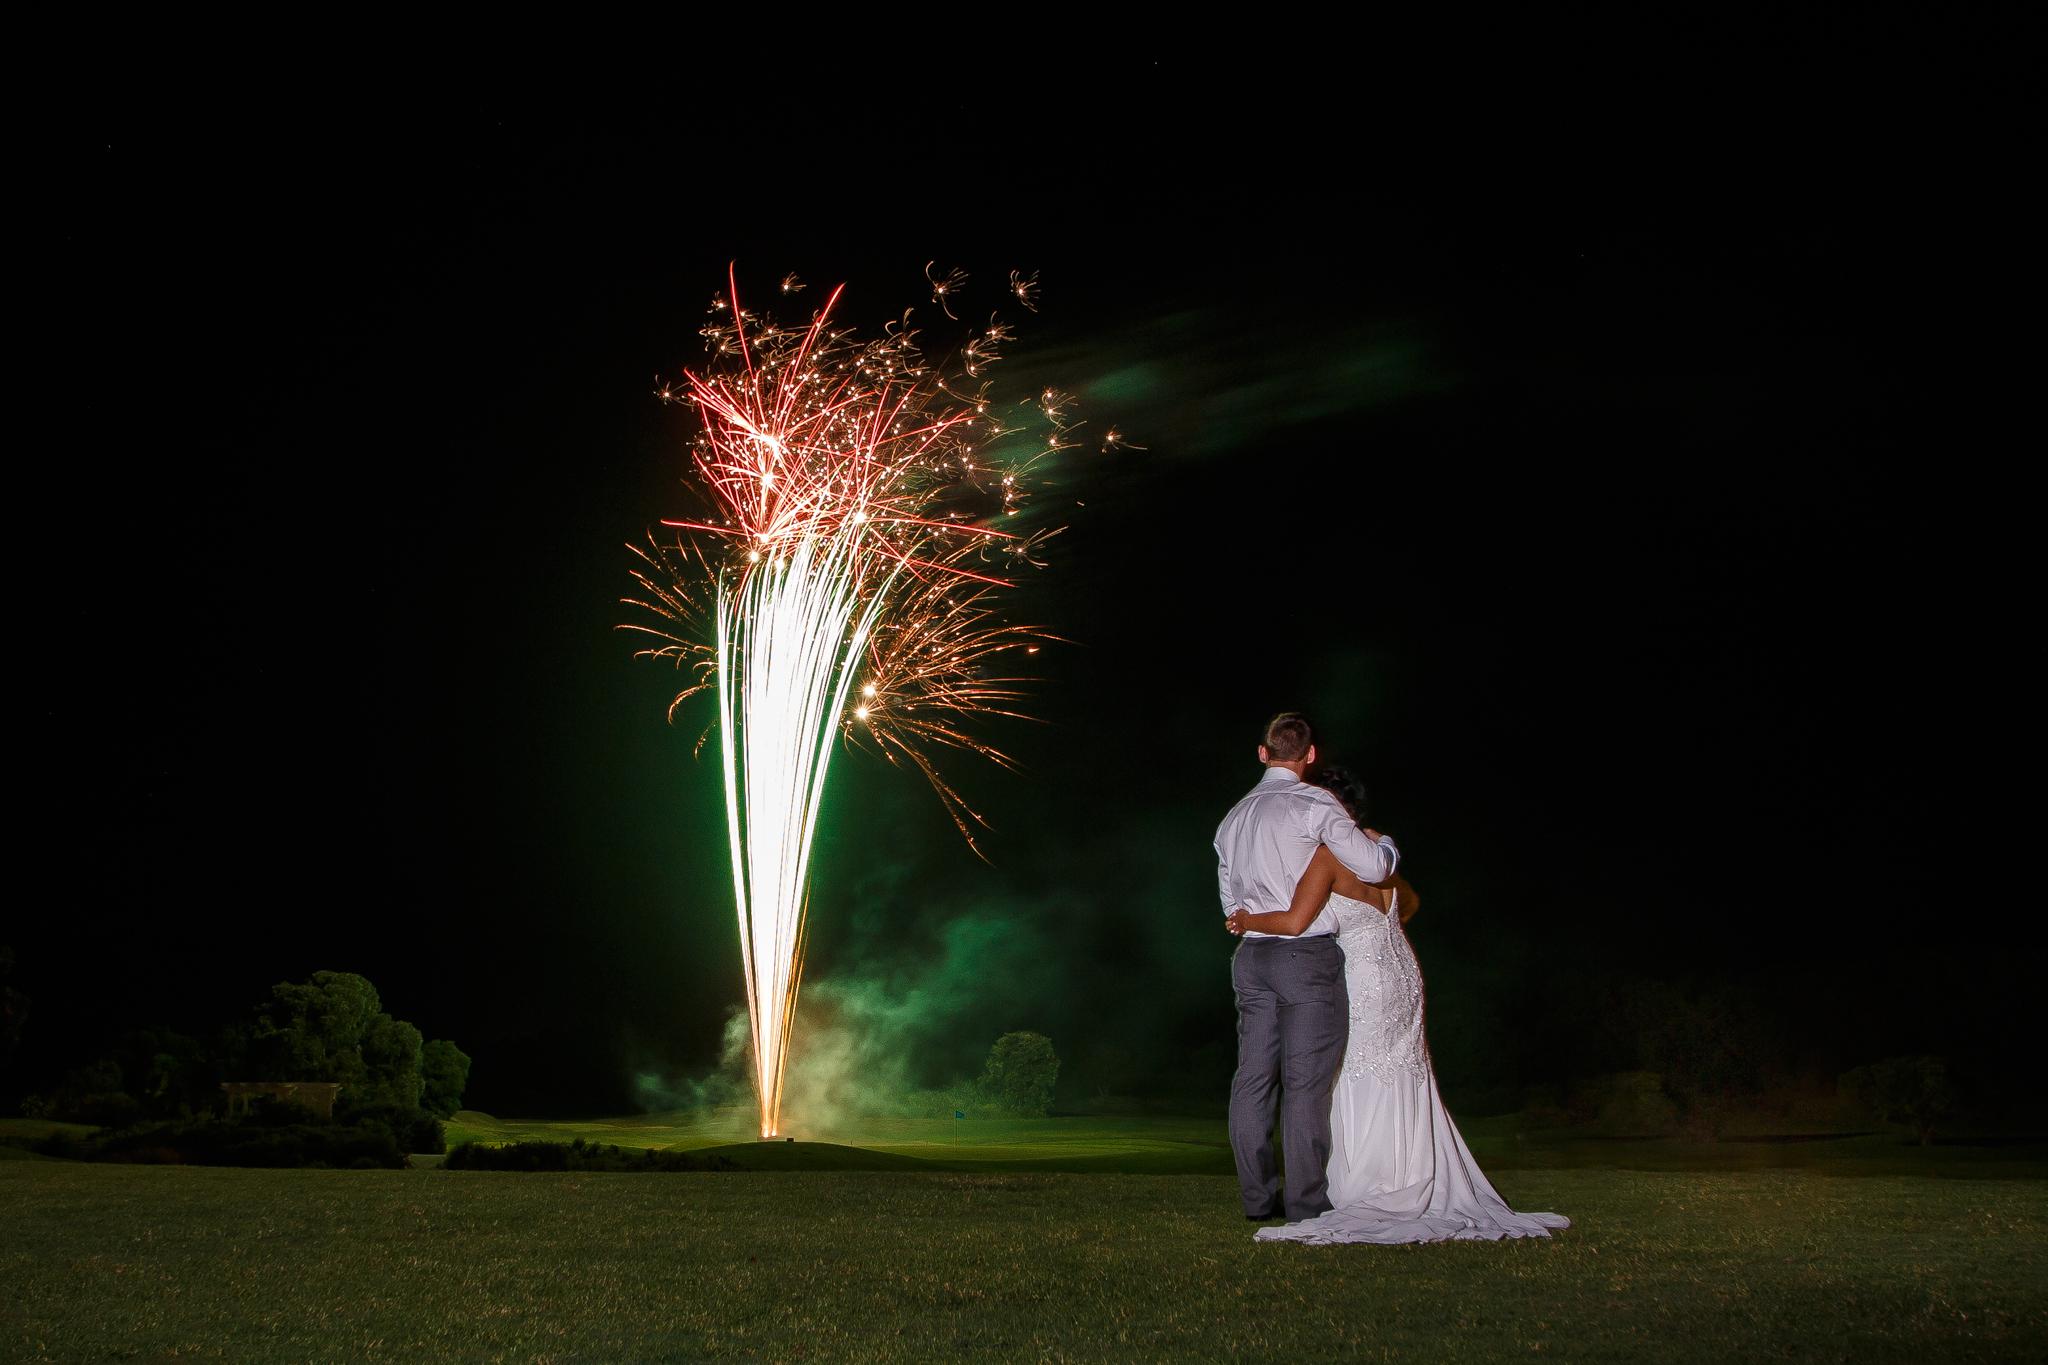 evening-fireworks-bride-groom.jpg